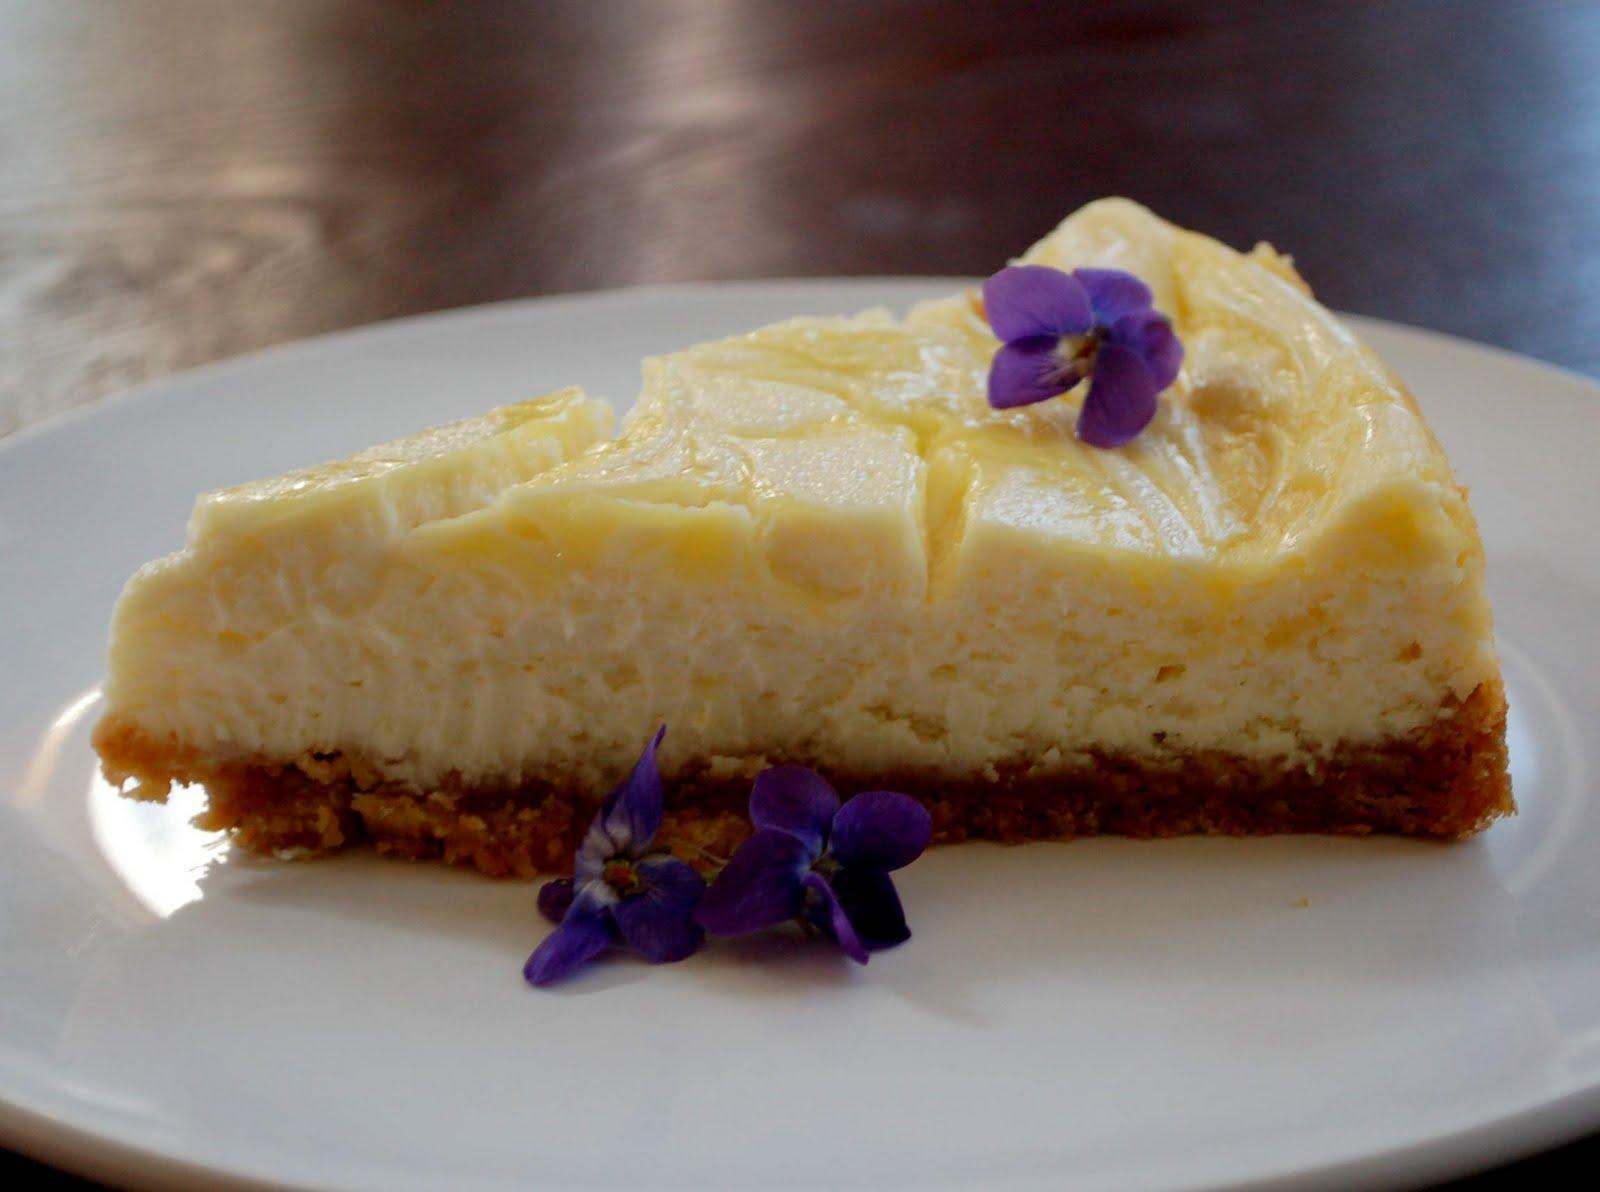 Lemon Curd Marbled Cheesecake - light-in-leaves